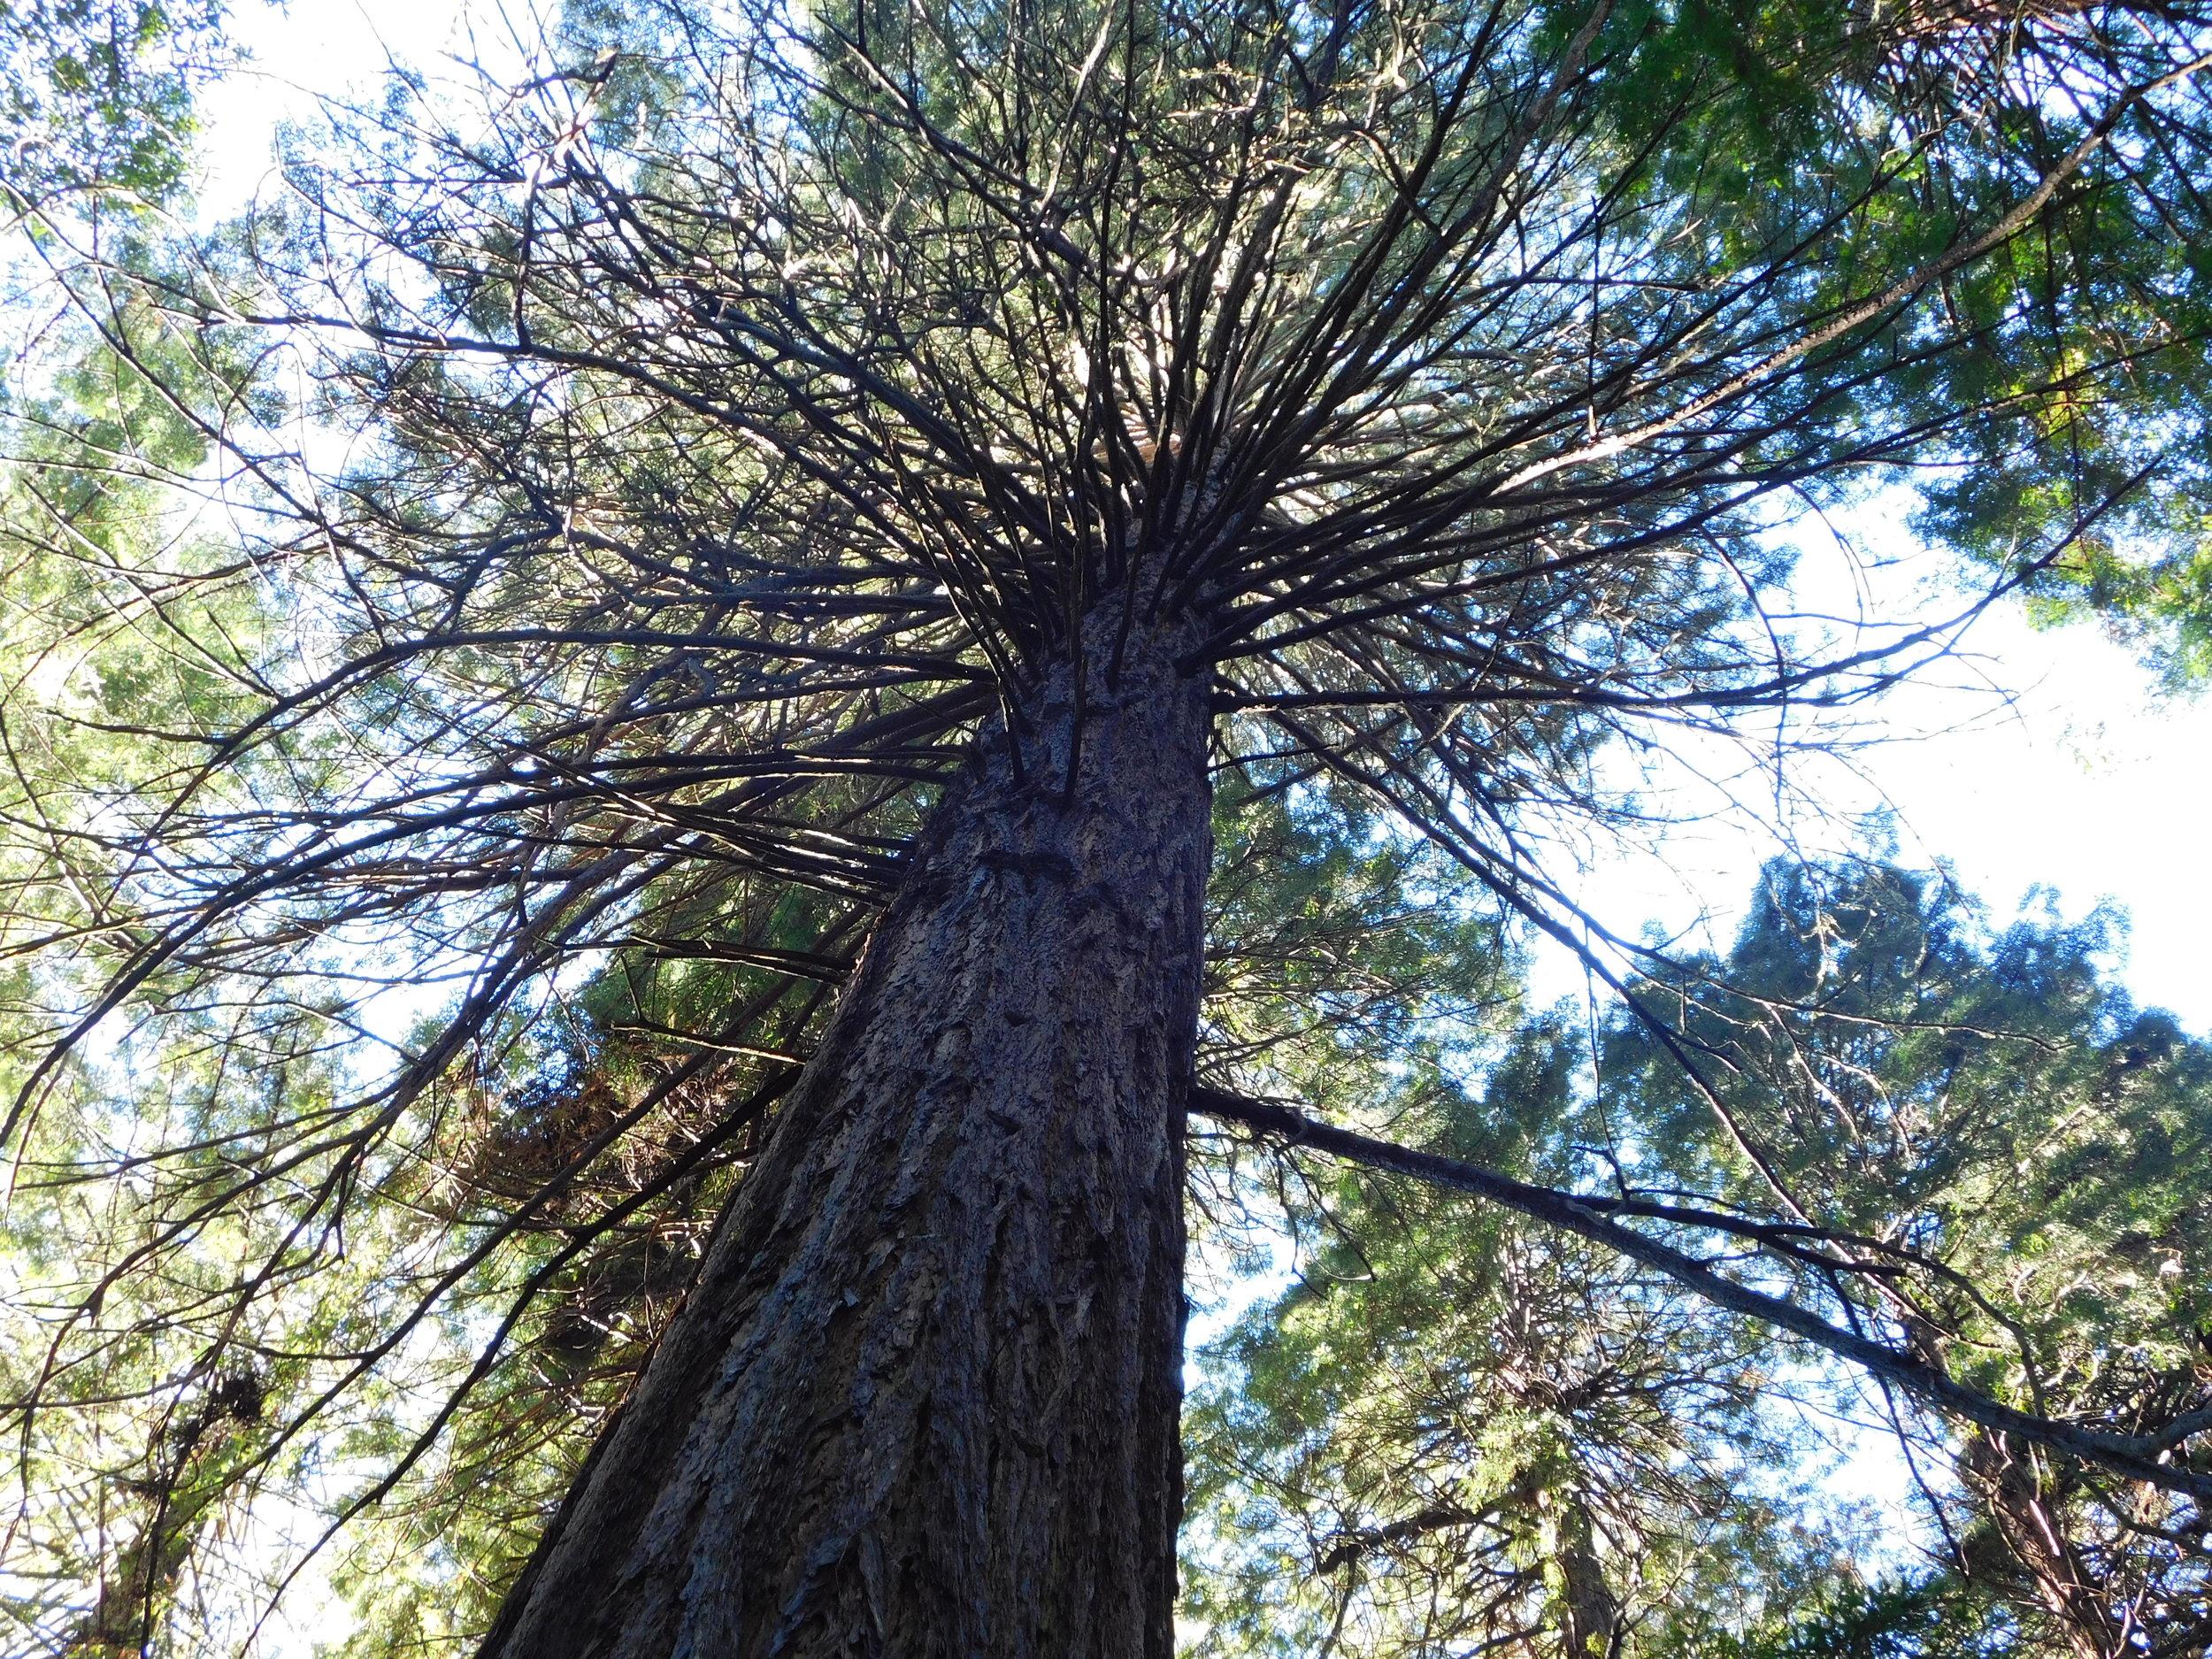 Tall Redwood trees!